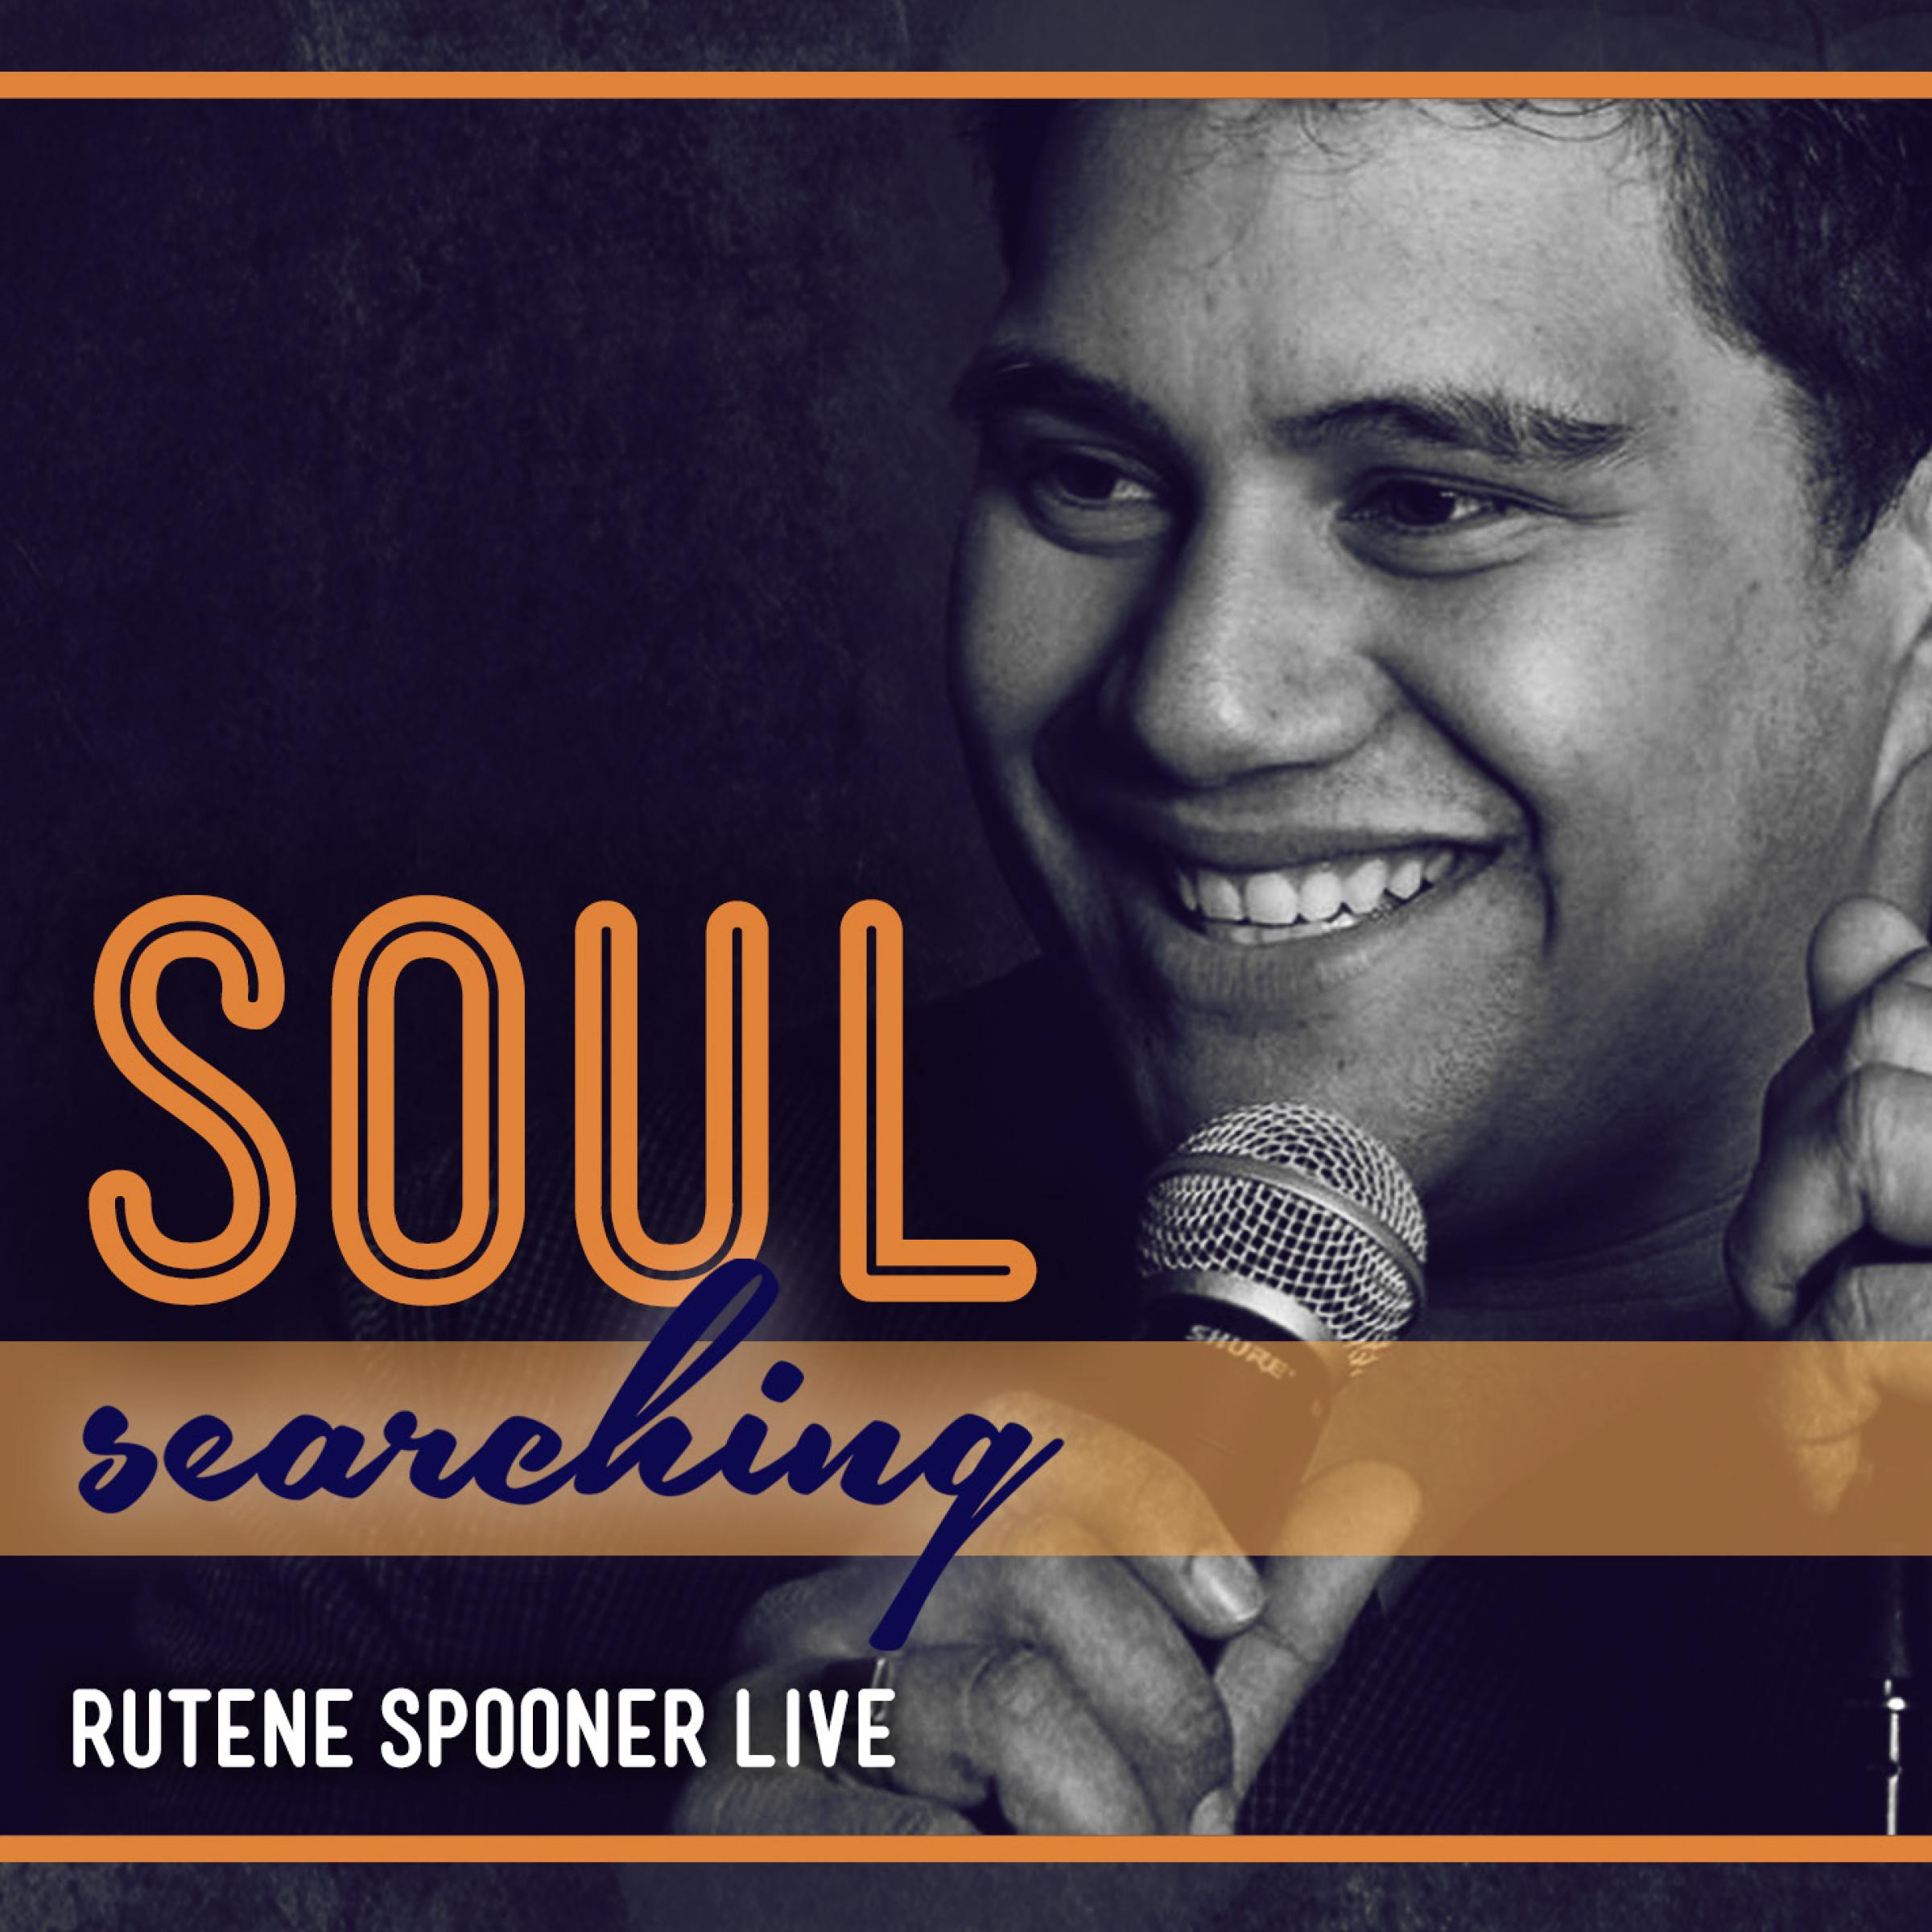 RUTENE SPOONER (Vocalist)